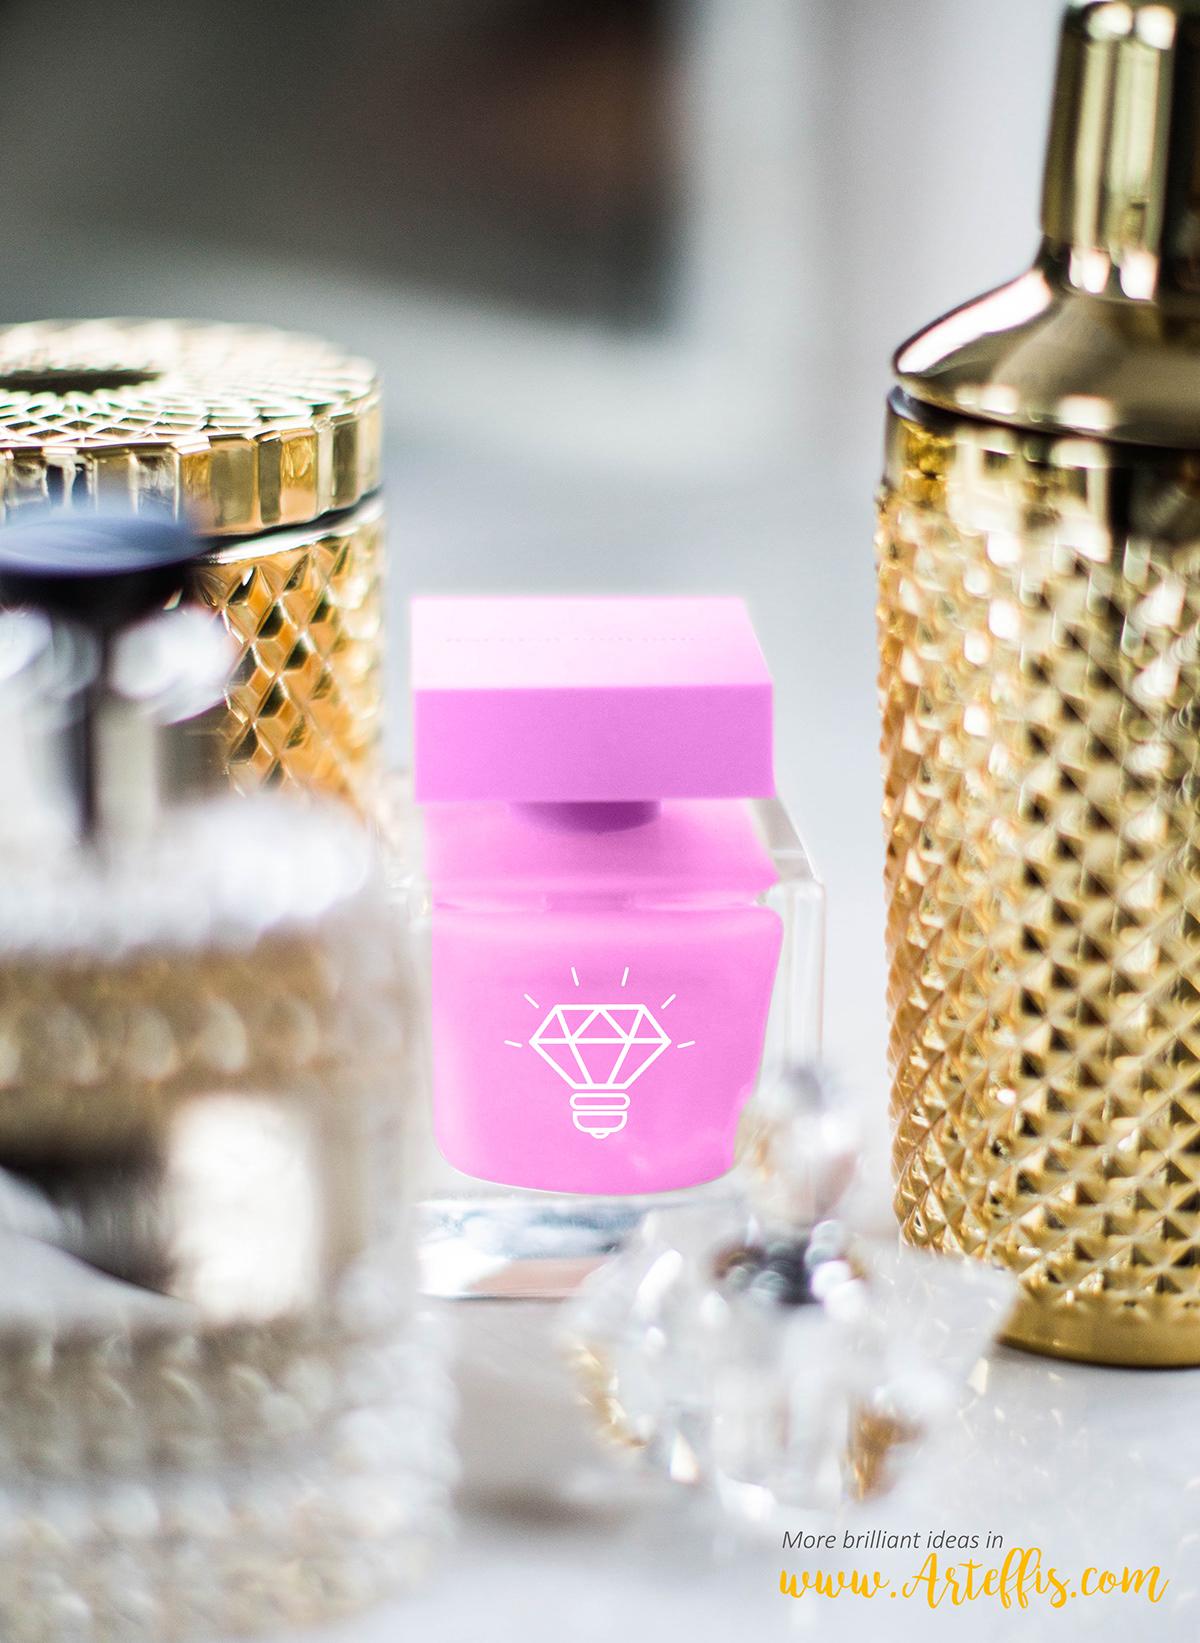 Perfume Bottle Free PSD Mockup